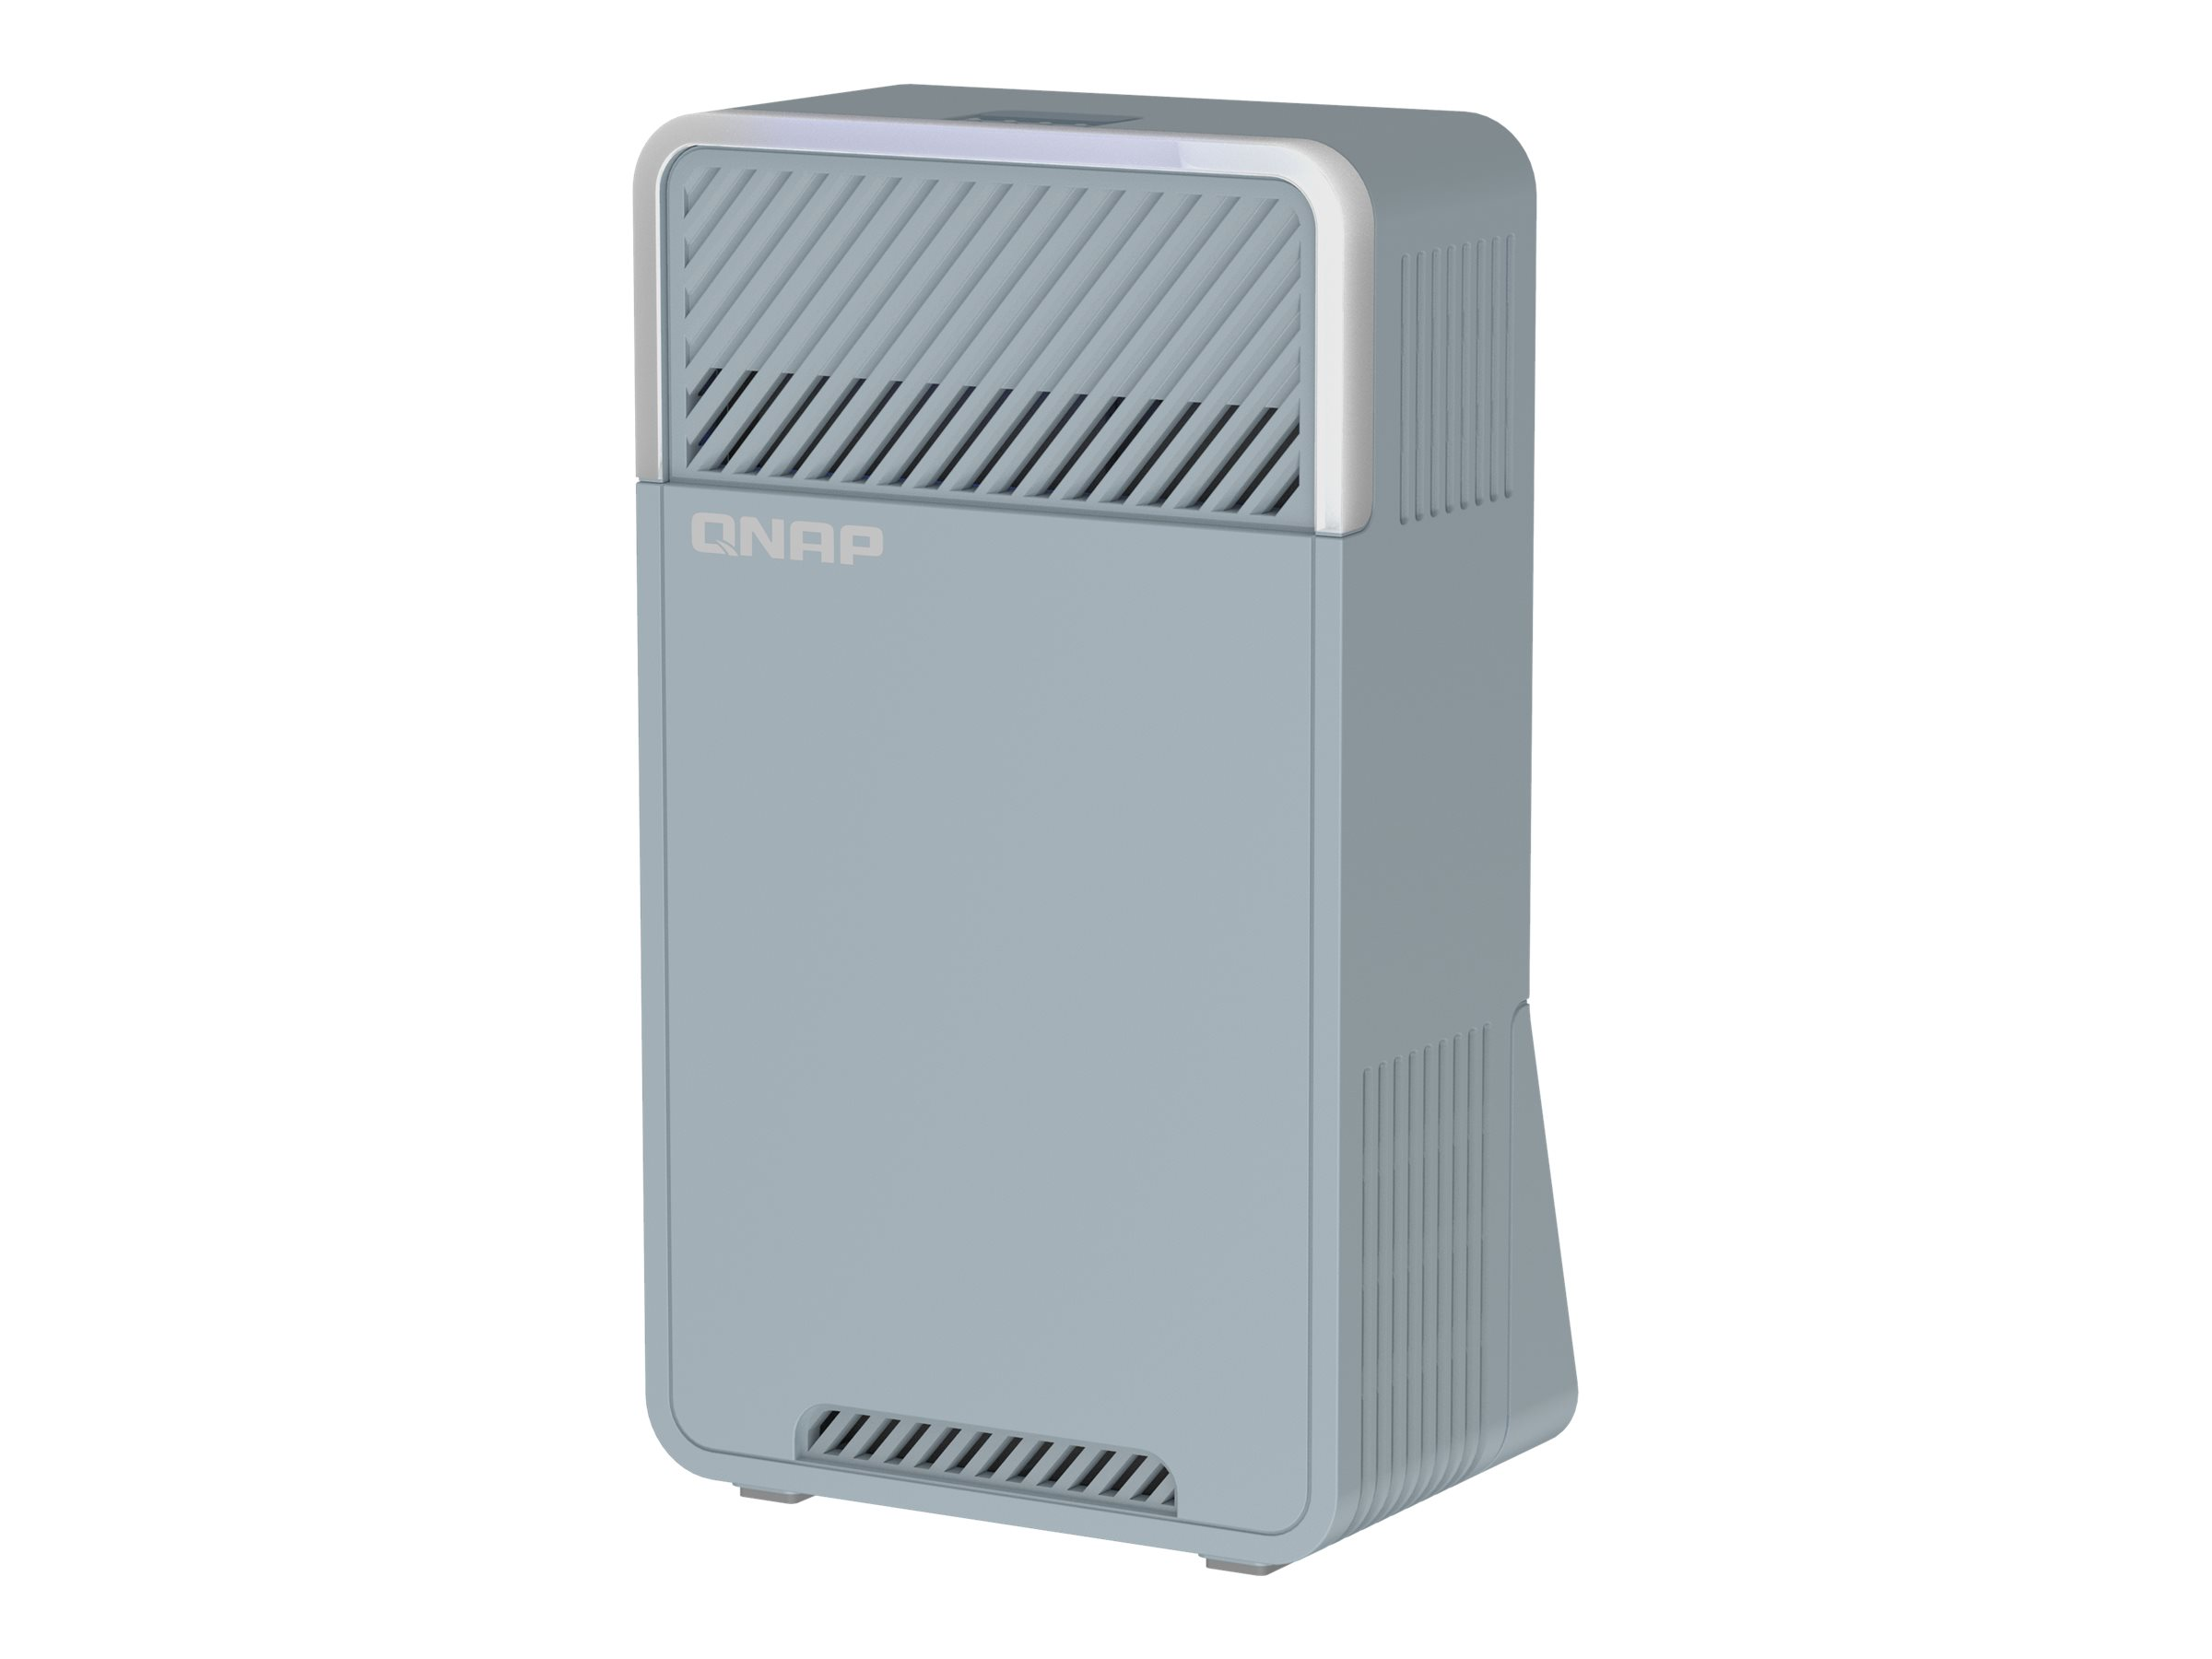 QNAP QMiro-201W - Wi-Fi system - 802.11a/b/g/n/ac, Bluetooth 5.0 - desktop